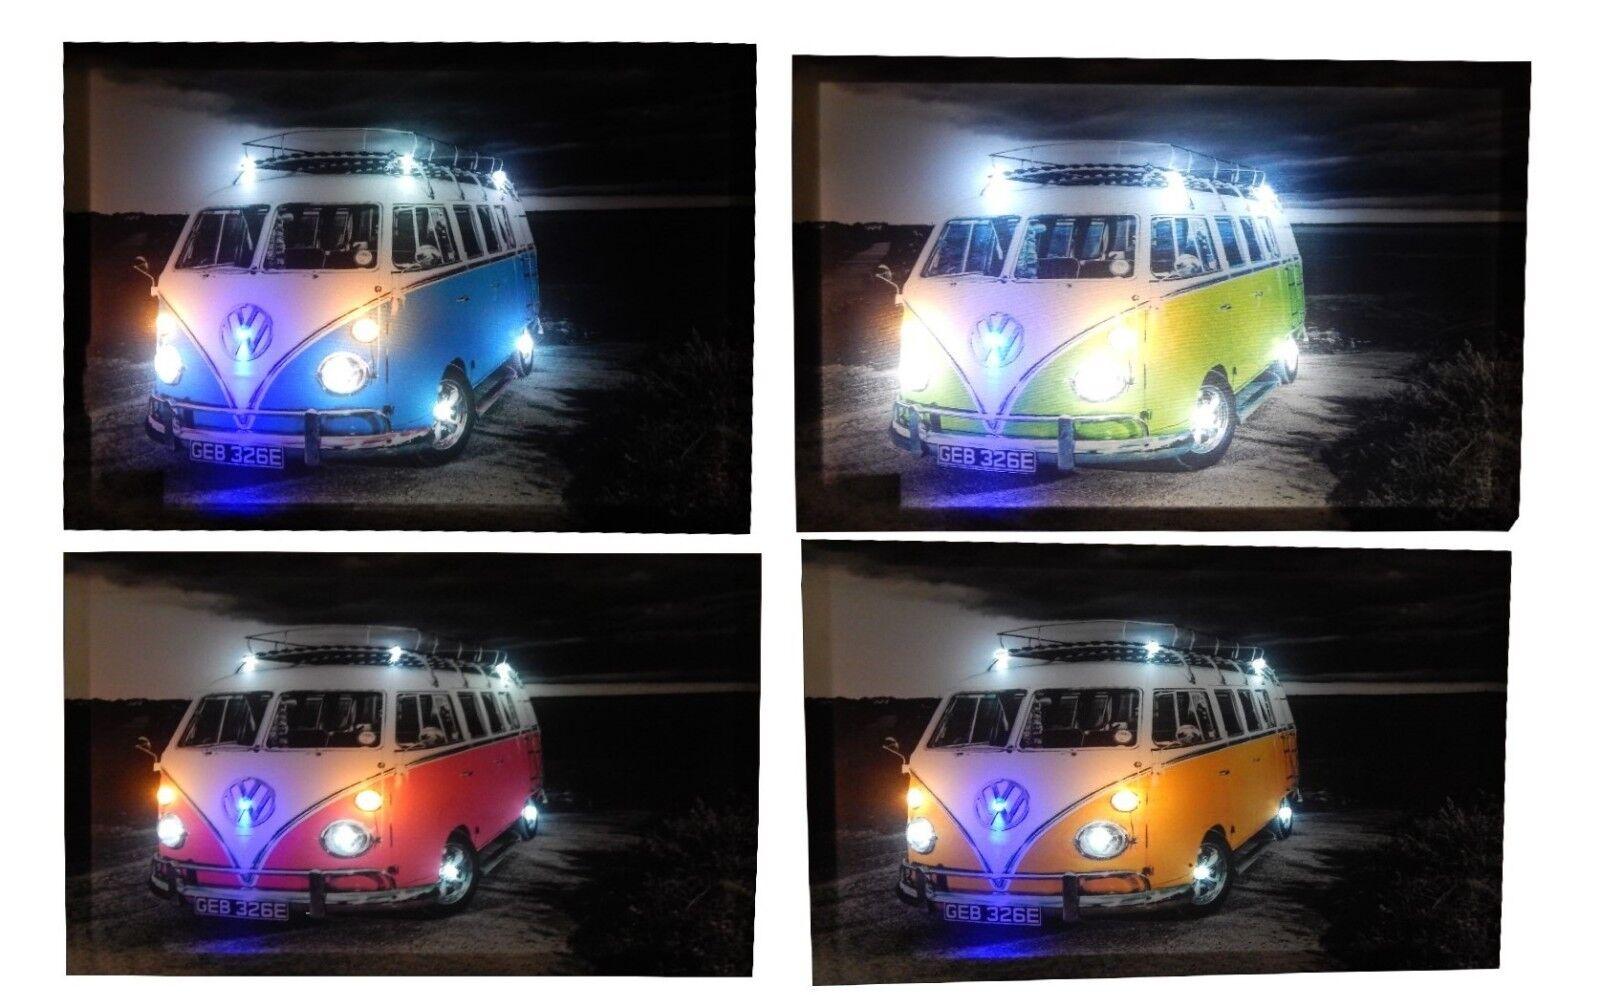 T1 T2 T3 Vw Bulli Bus leinwandbild LED Leucht bild Beleuchtung Wohnzimmer 45x65